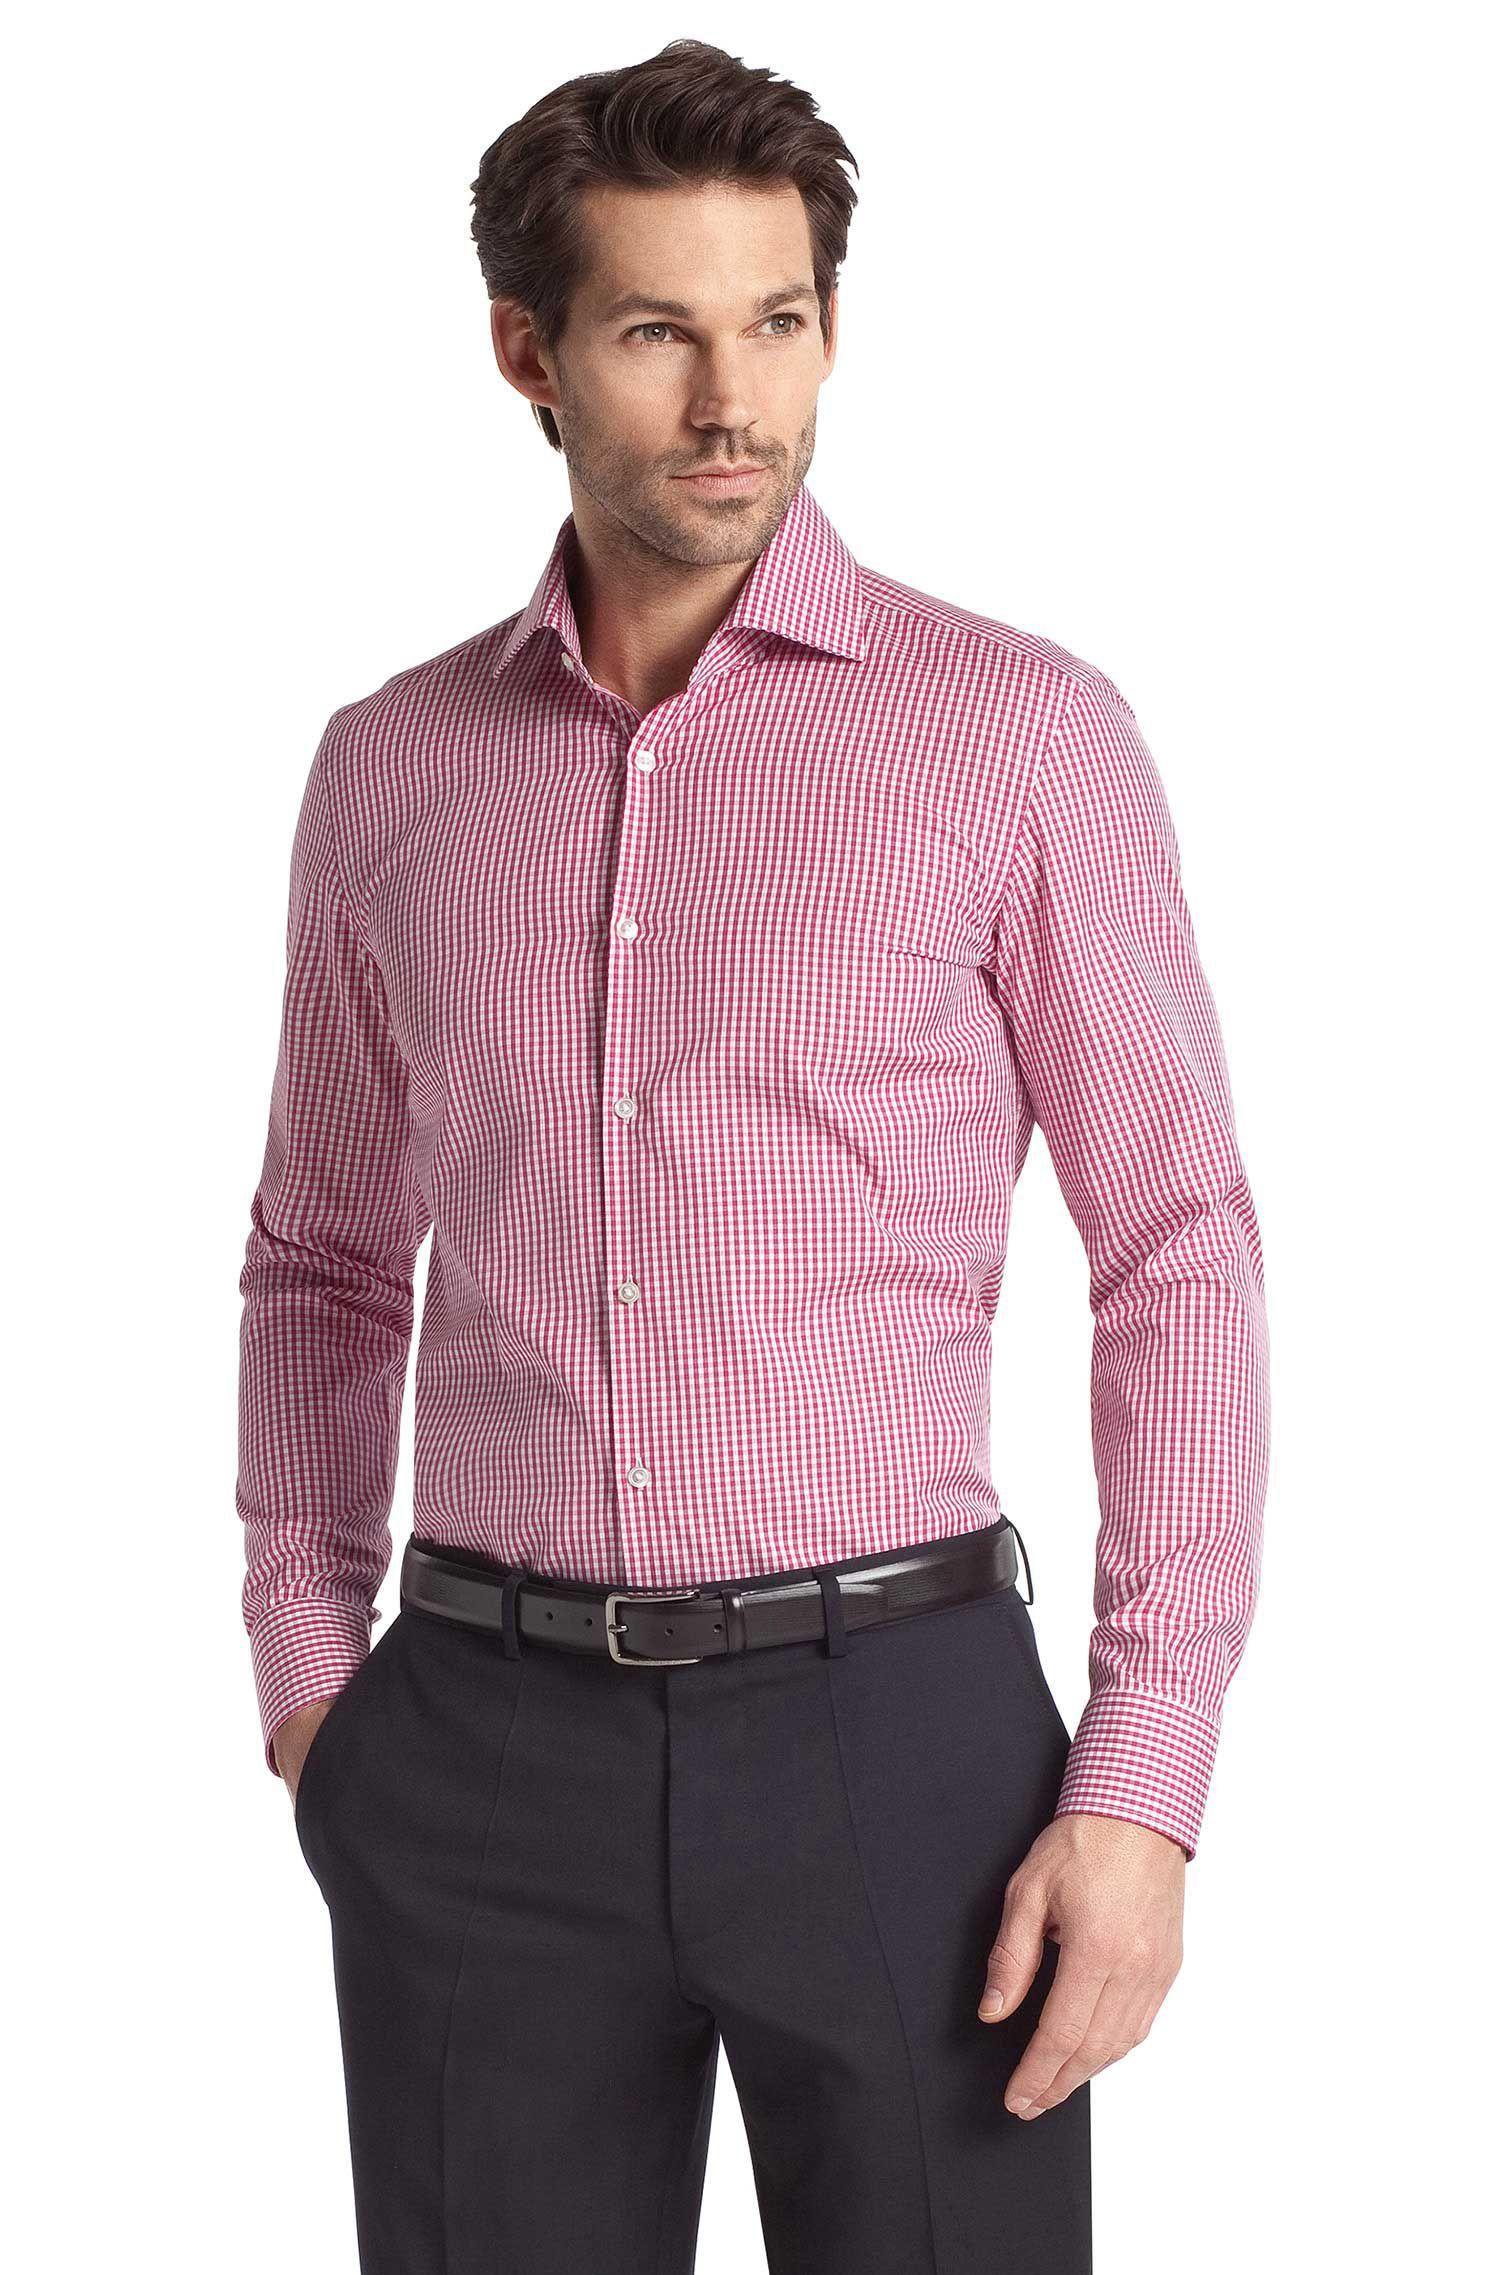 Business-overhemd ´Jaron` met windsorkraag